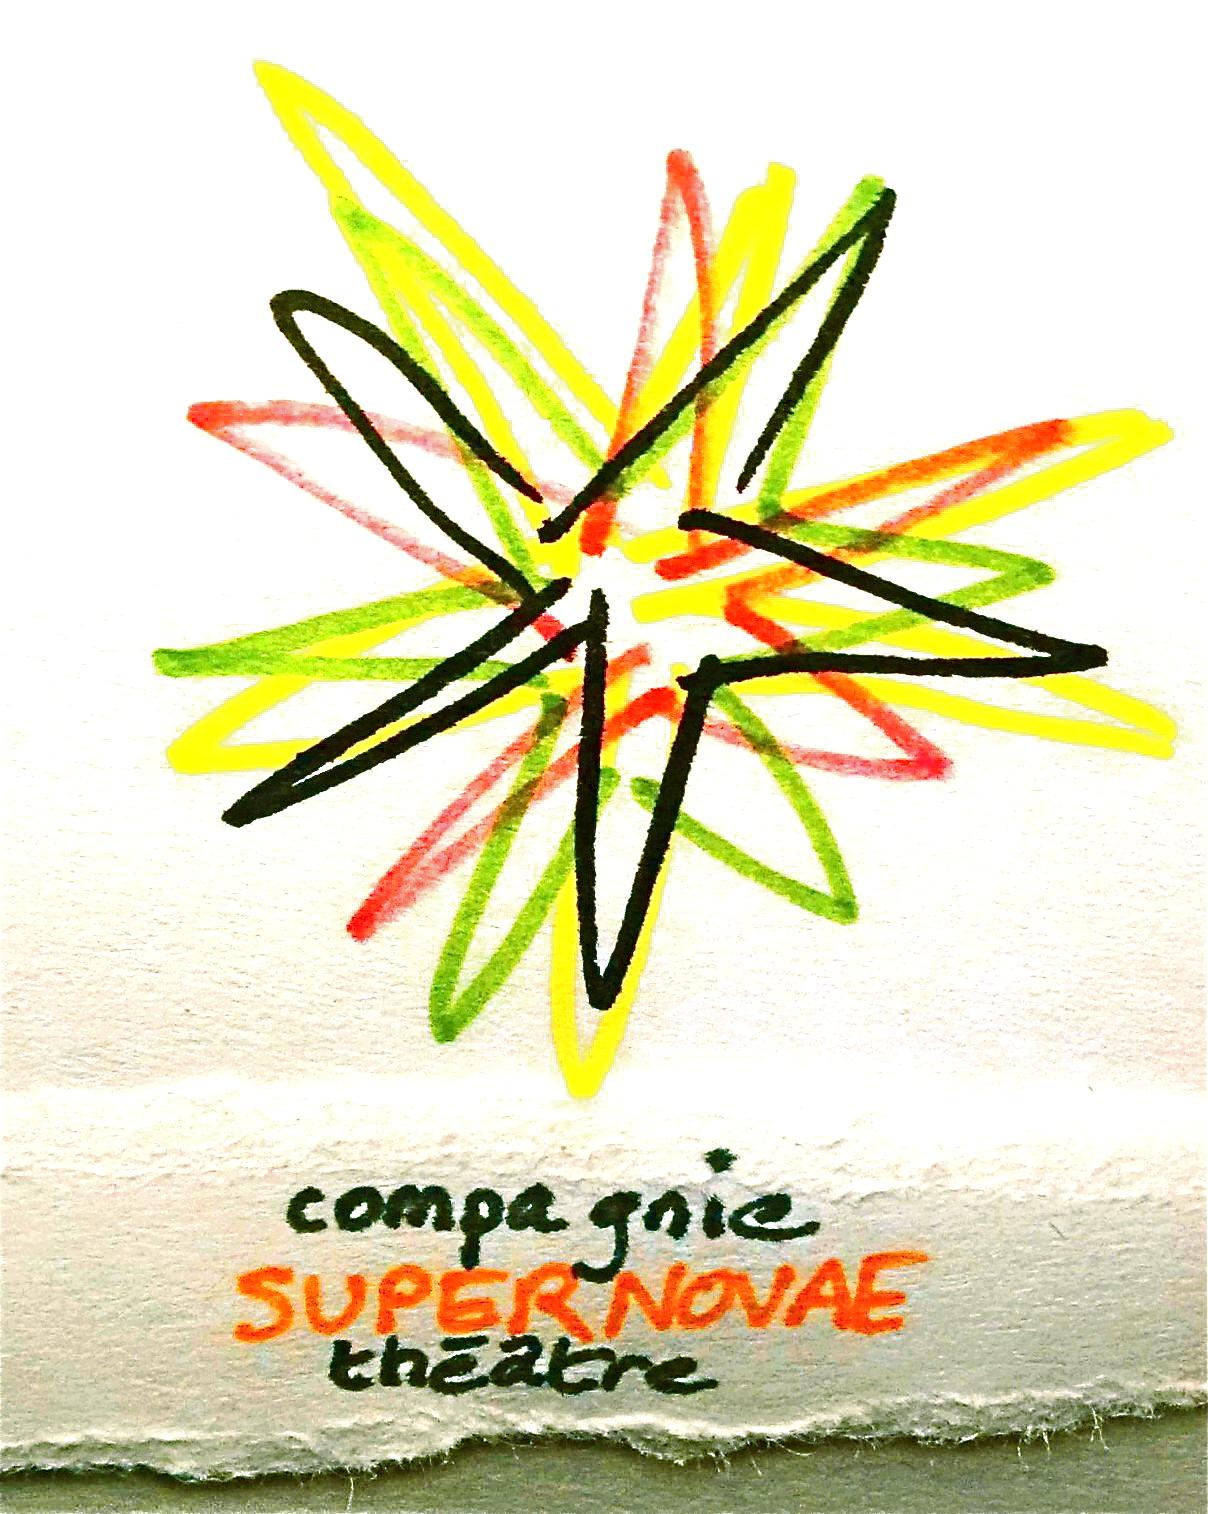 Compagnie SUPERNOVAE